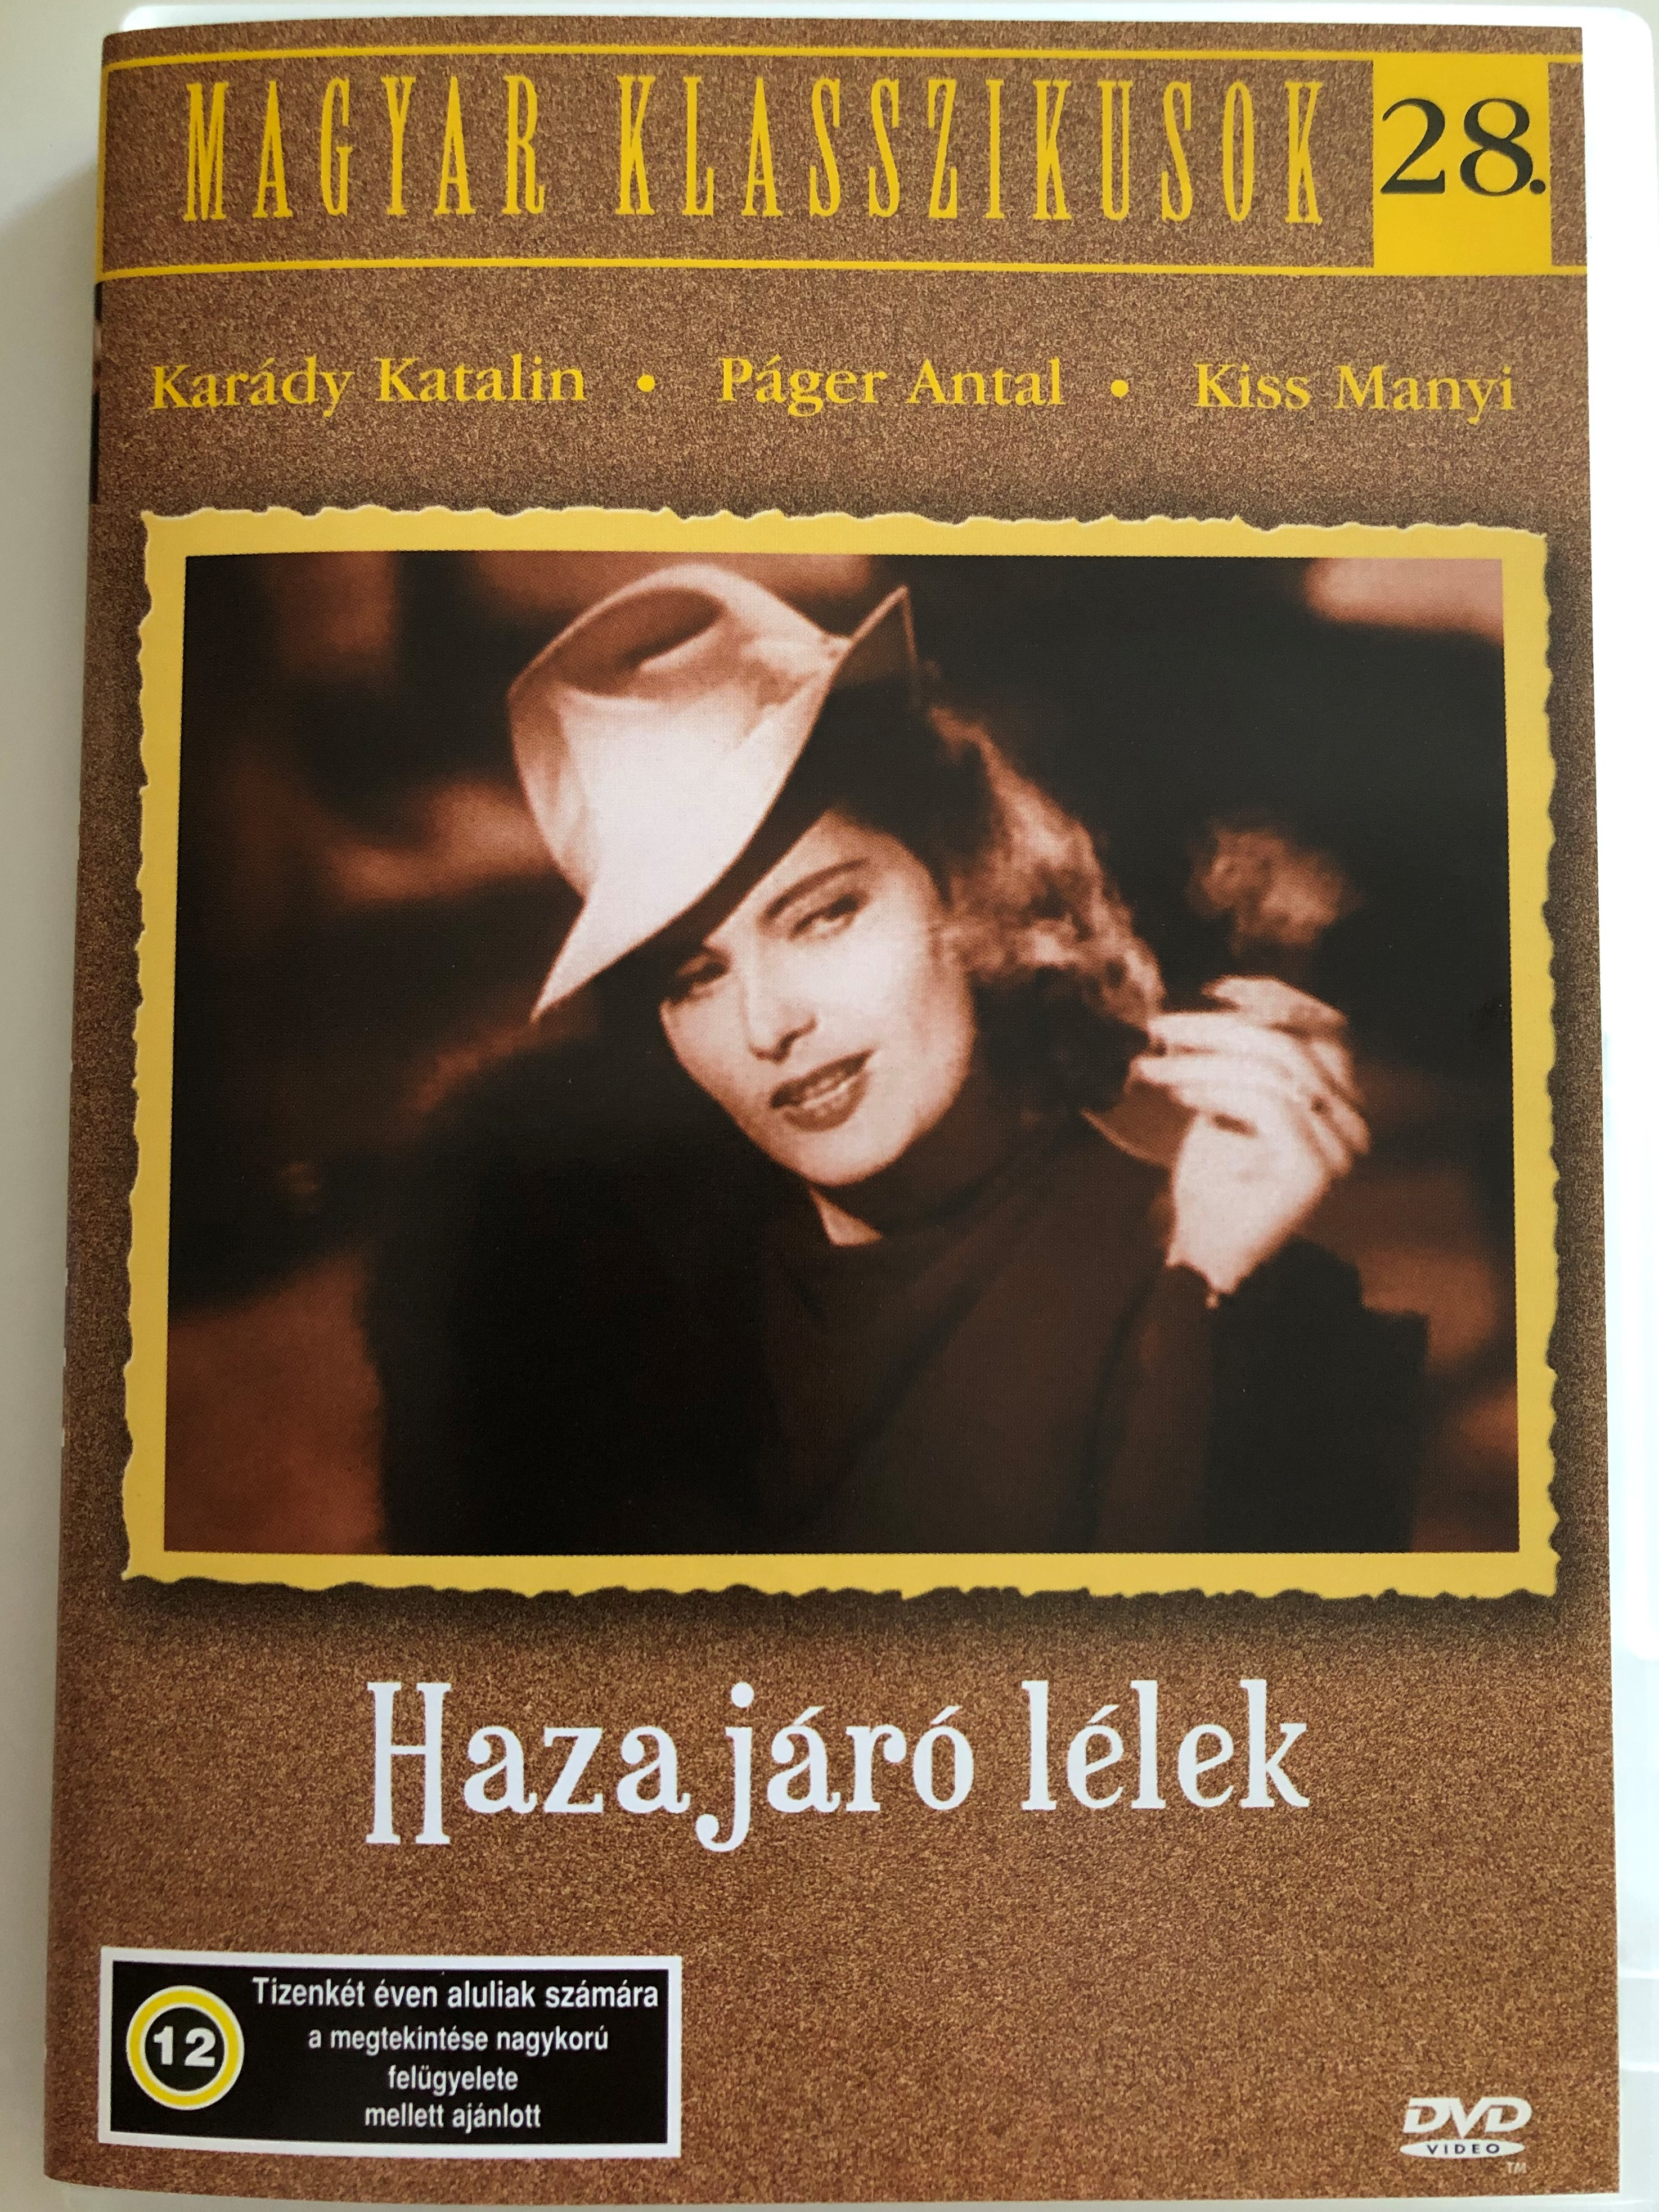 hazaj-r-l-lek-dvd-1940-directed-by-zilahy-lajos-starring-kar-dy-katalin-p-ger-antal-kiss-manyi-hungarian-b-w-classic-film-magyar-klasszikusok-28.-1-.jpg